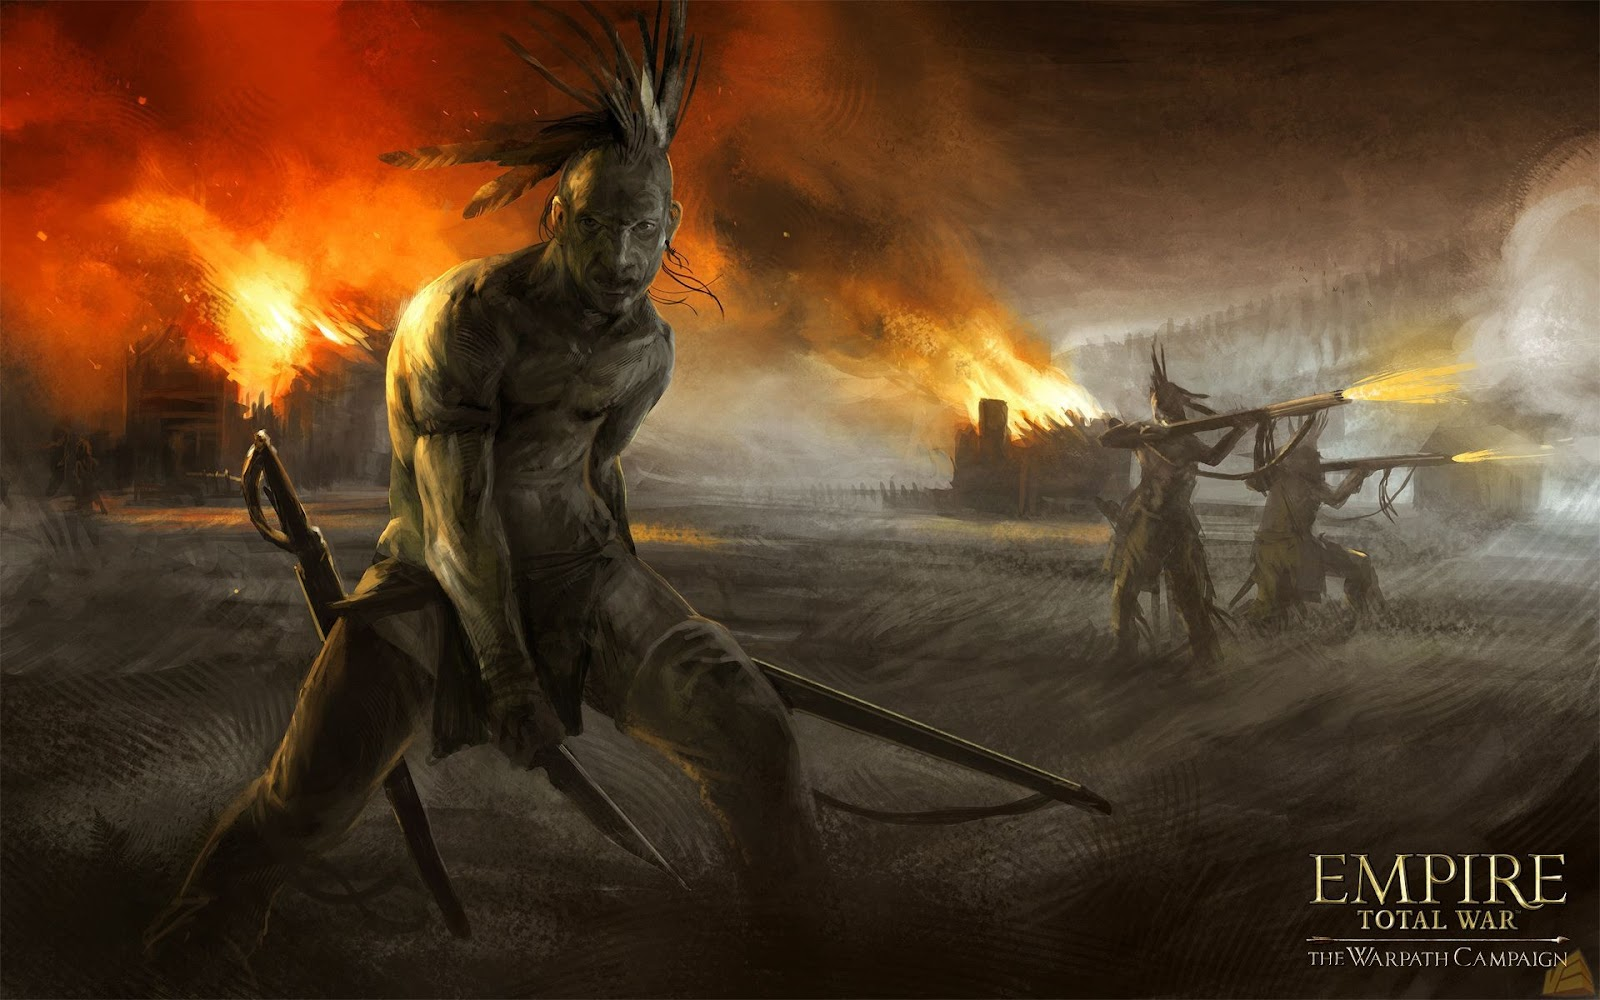 http://3.bp.blogspot.com/-zokVBoAhOmc/T9wh6egspMI/AAAAAAAADW8/cjmmX-SCHkQ/s1600/Empire+Total+War+HD+Wallpapers+%252818%2529.jpg